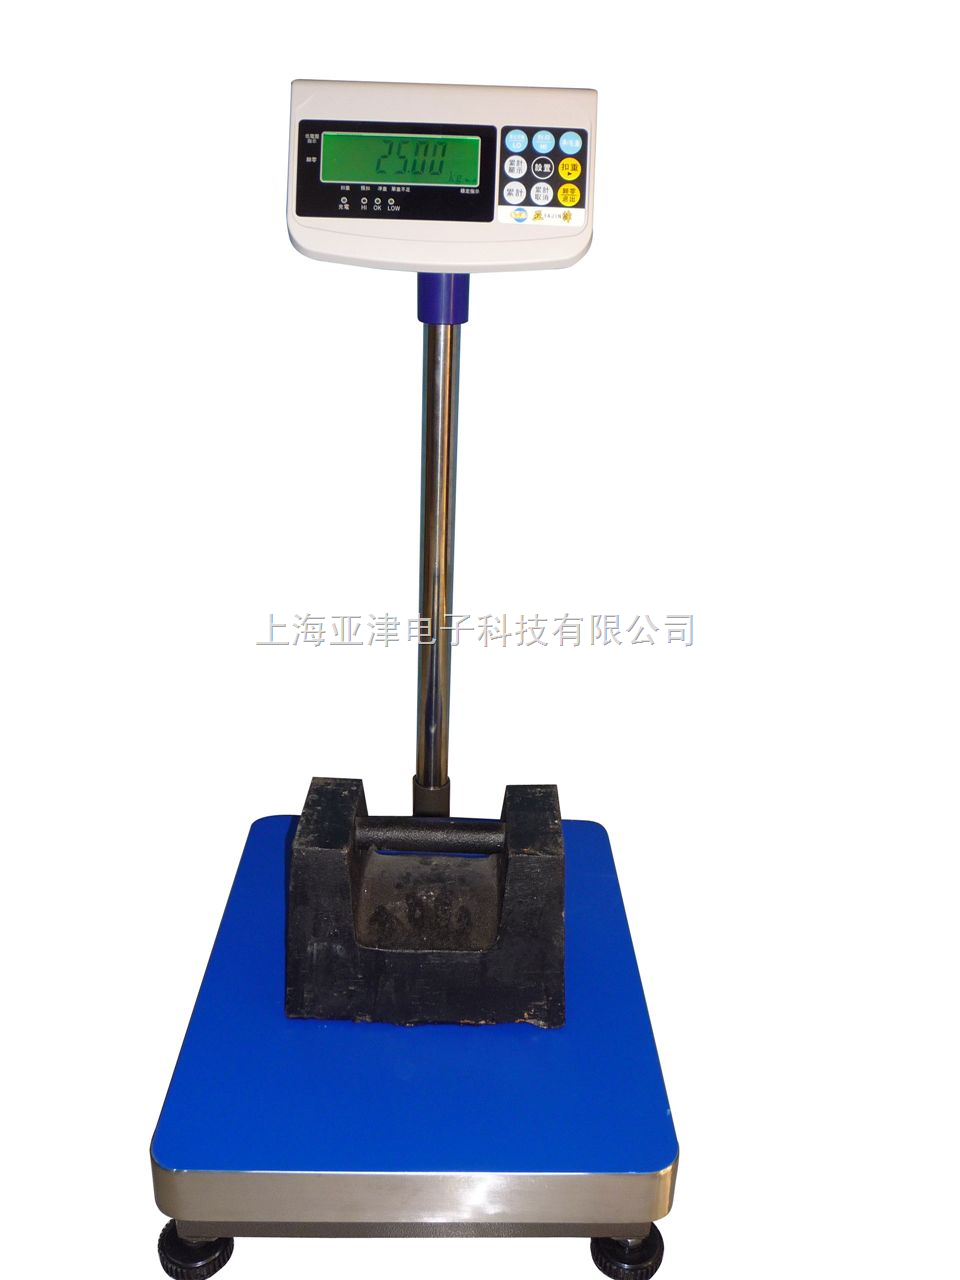 TCS60kg/5g电子秤,150公斤电子磅,LED显示磅秤